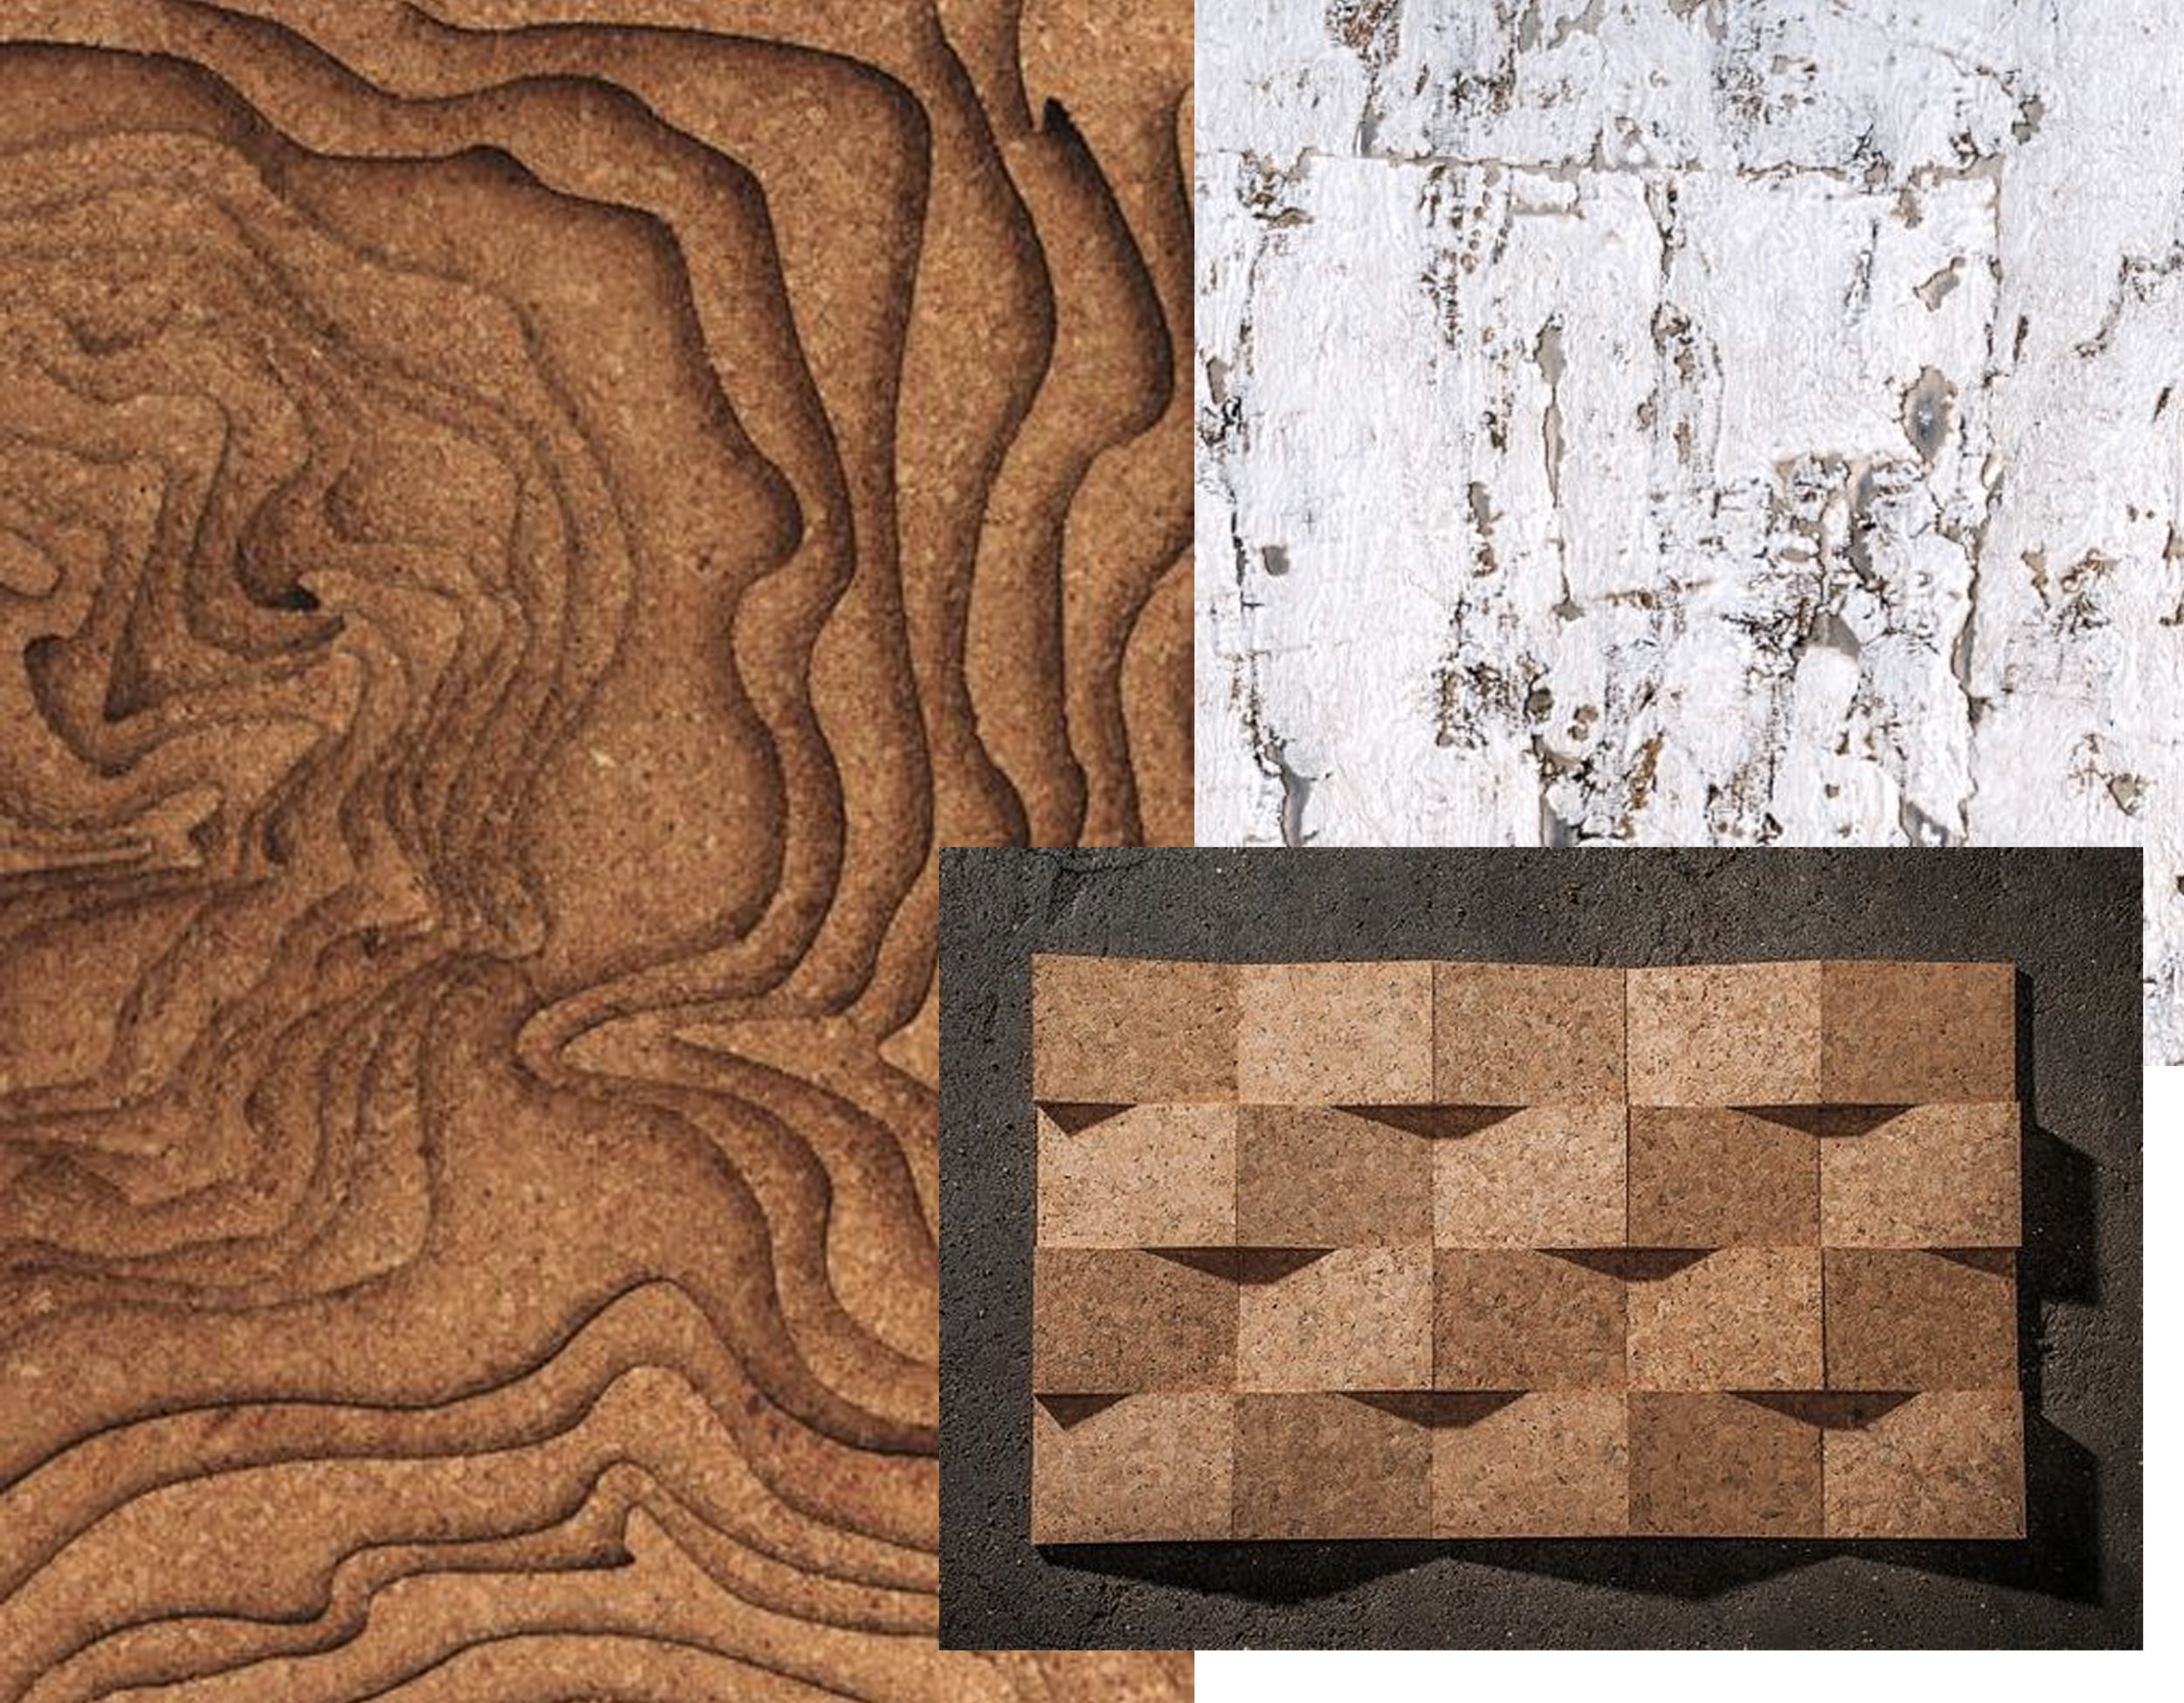 cork lasercut  Engravers Network  - wallpaper Eclat  Elitis  - cork 3dimensional  Amorim